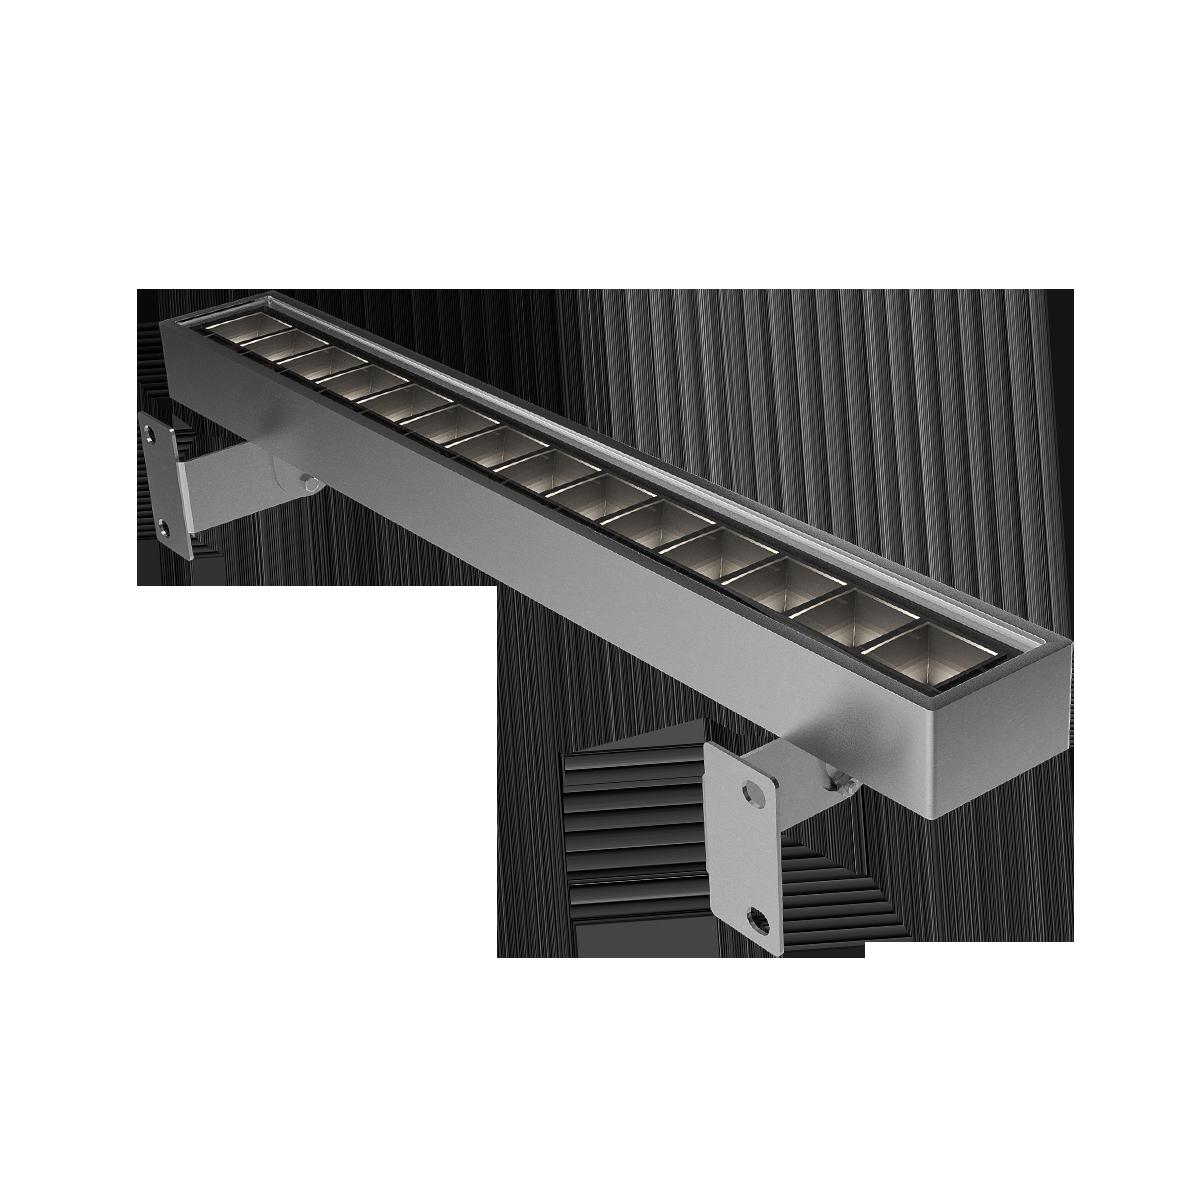 TRIF LANE FACADE OPTIC - линейные прожекторы  на заказ